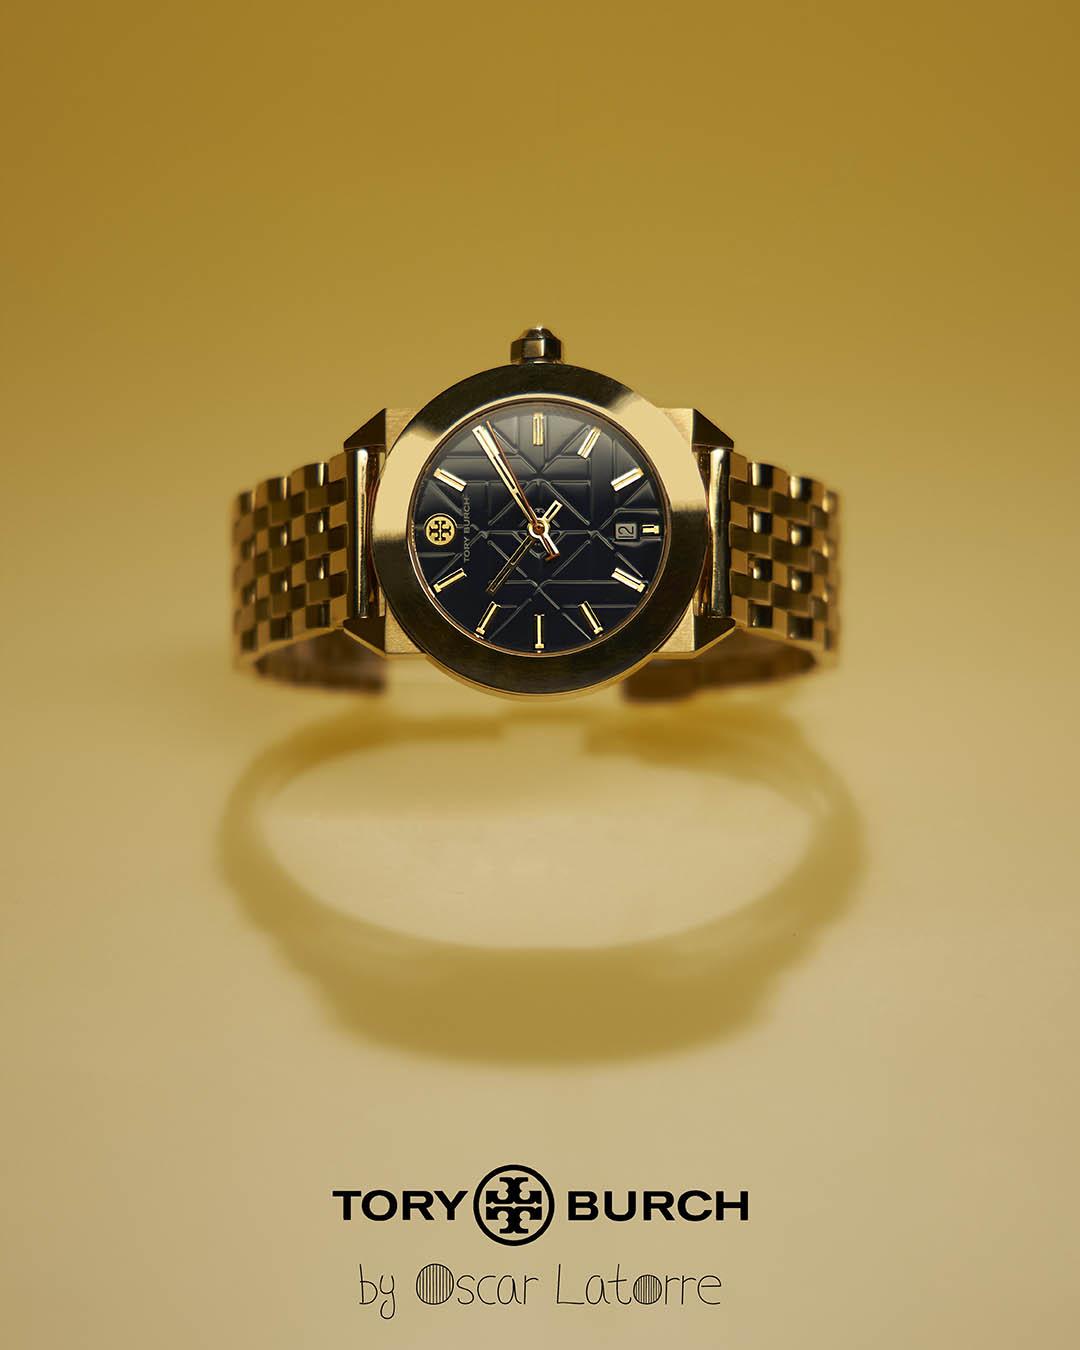 Tory Burch by Oscar Latorre